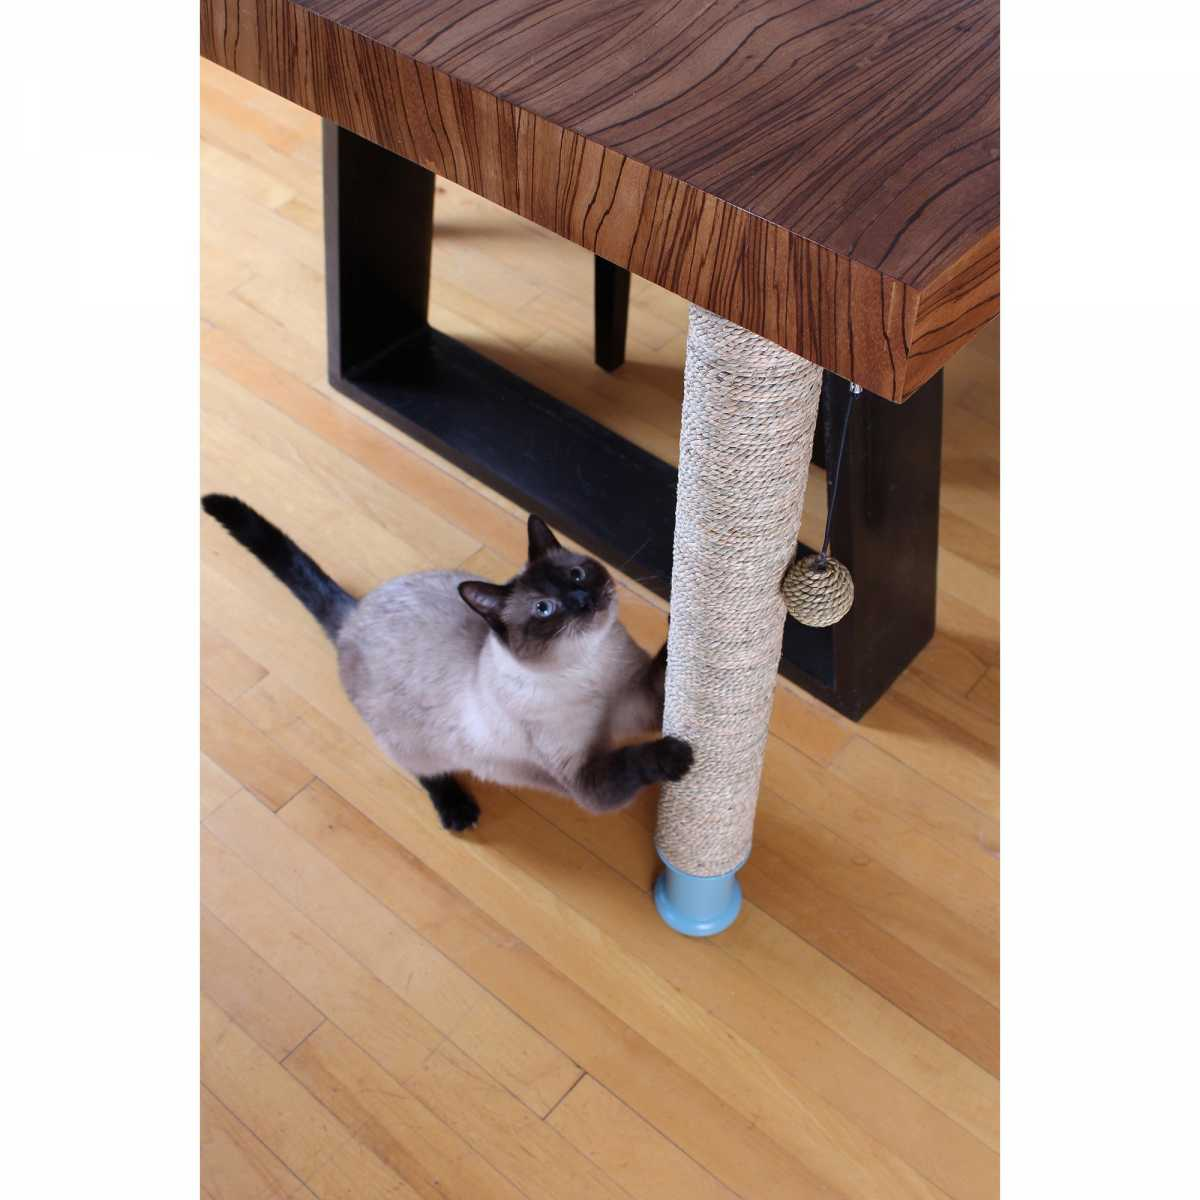 b825e349de19 Under Table Cat Scratching Pole - CatsPlay Superstore